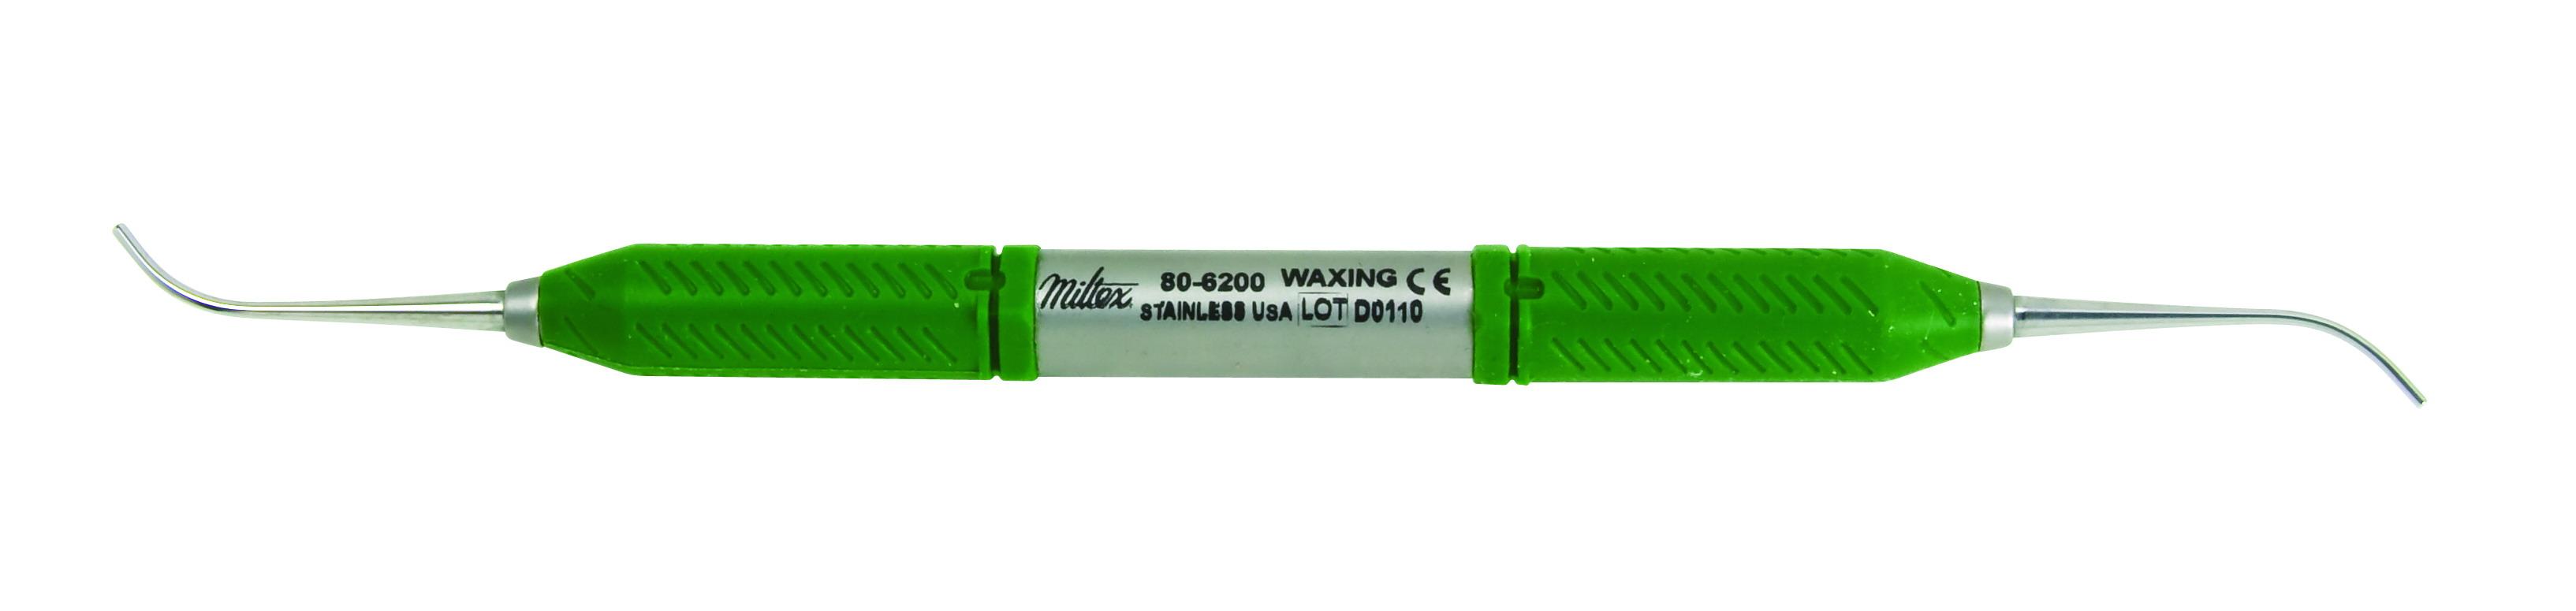 burnisher-waxing-dbl-end-1-80-6200-miltex.jpg